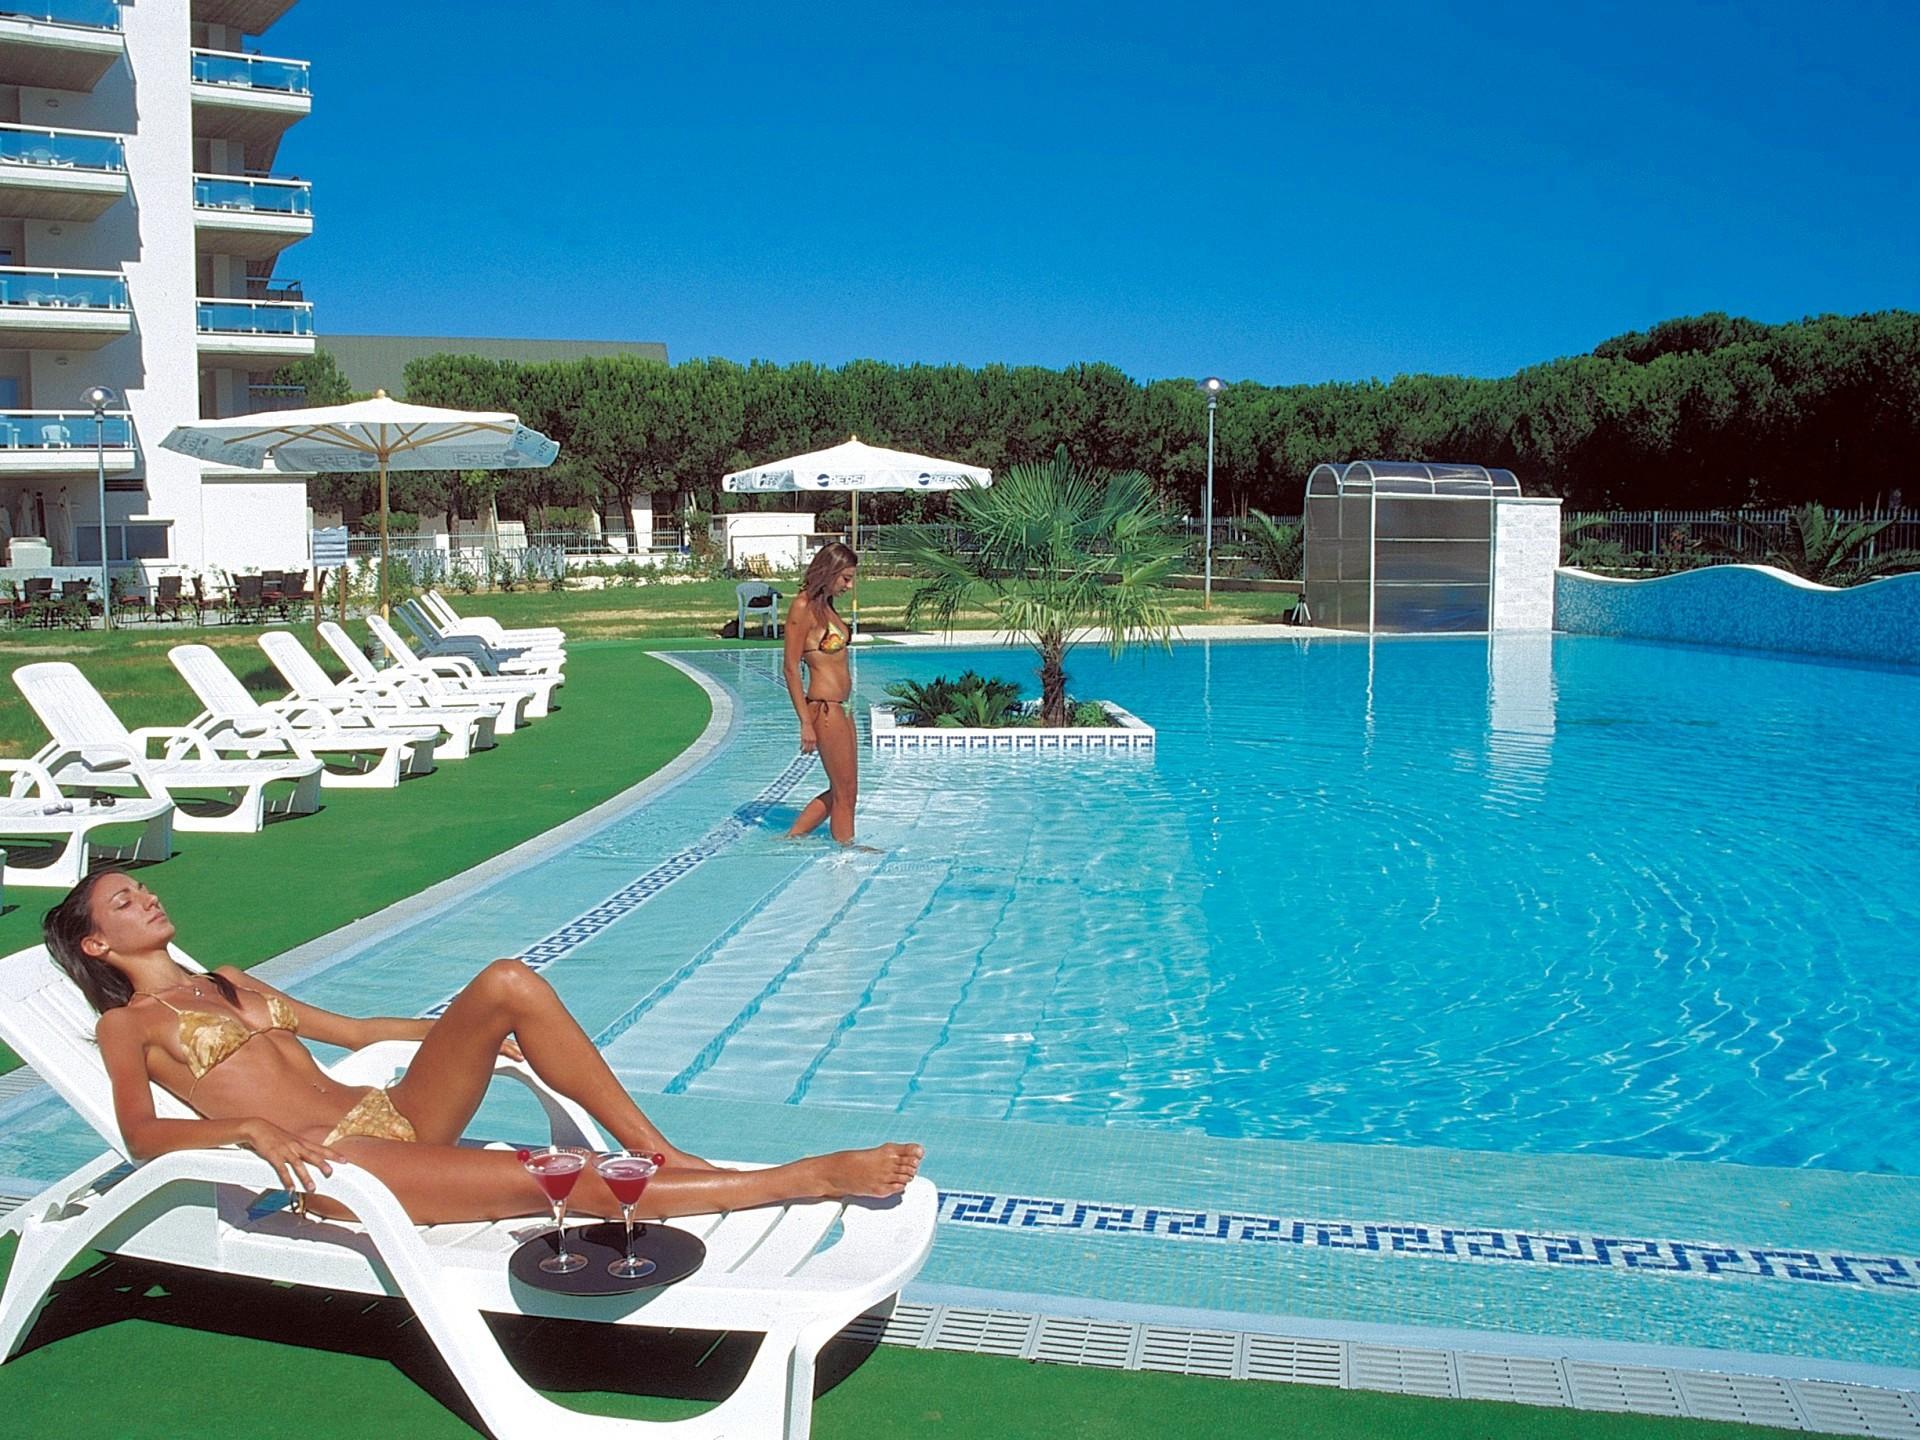 Užijte si moře i bazén i v Silvi Marina v Abruzzu